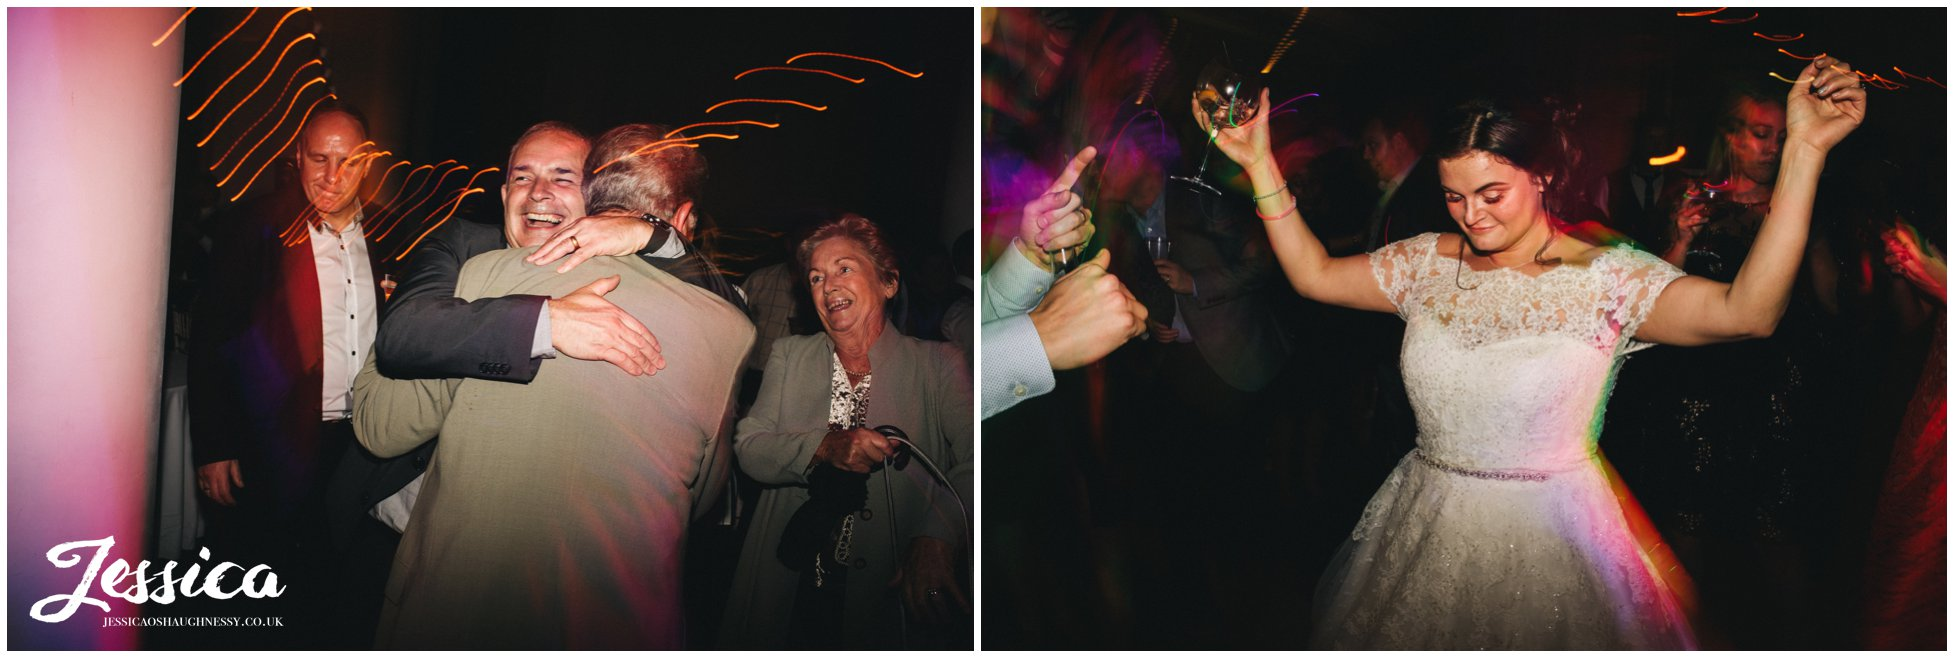 bride dances on her wedding day in liverpool